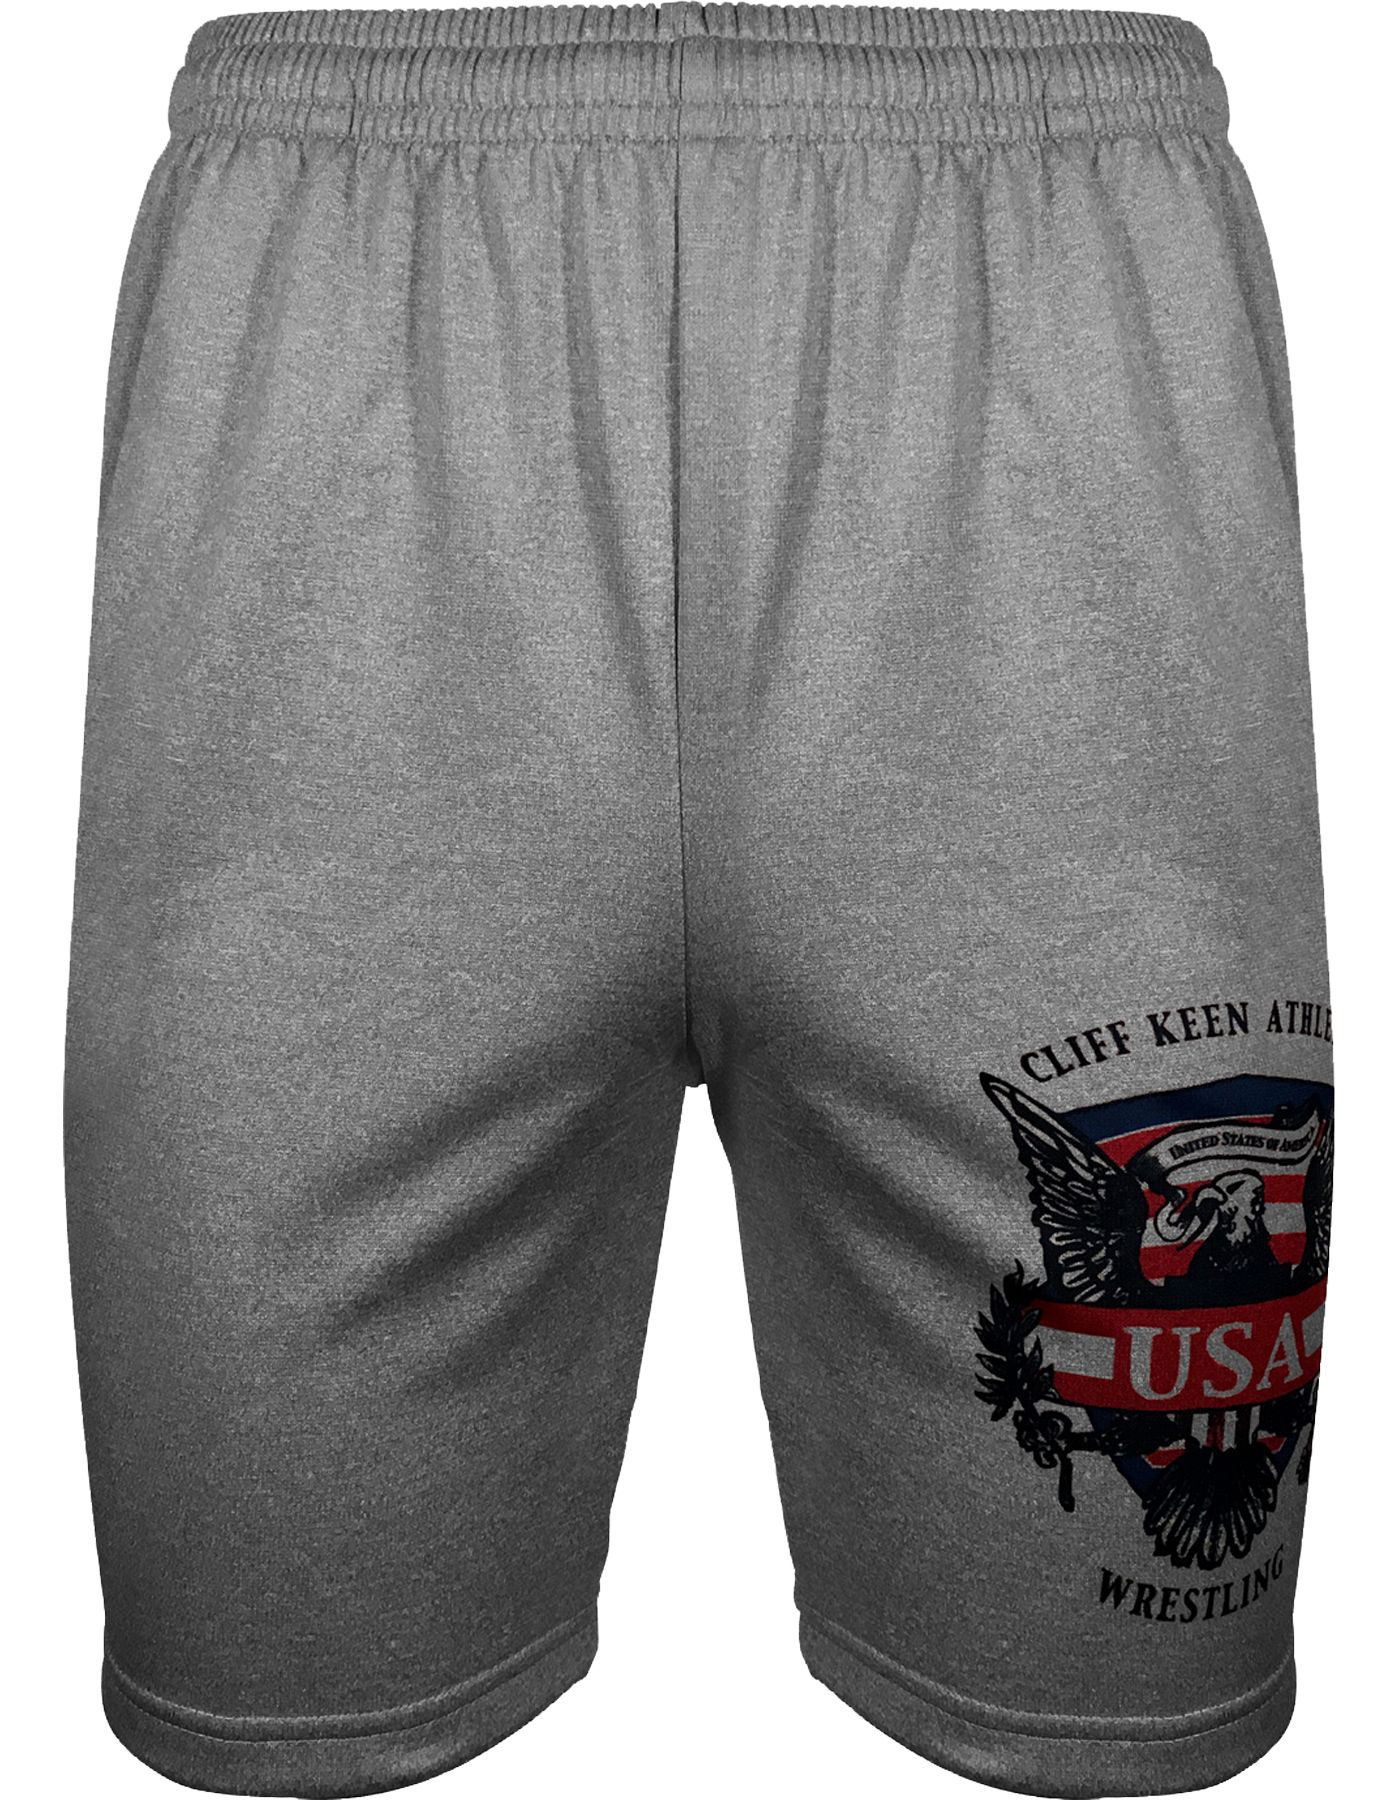 Cliff Keen Adult Historic Eagle Xtreme Fleece Wrestling Shorts